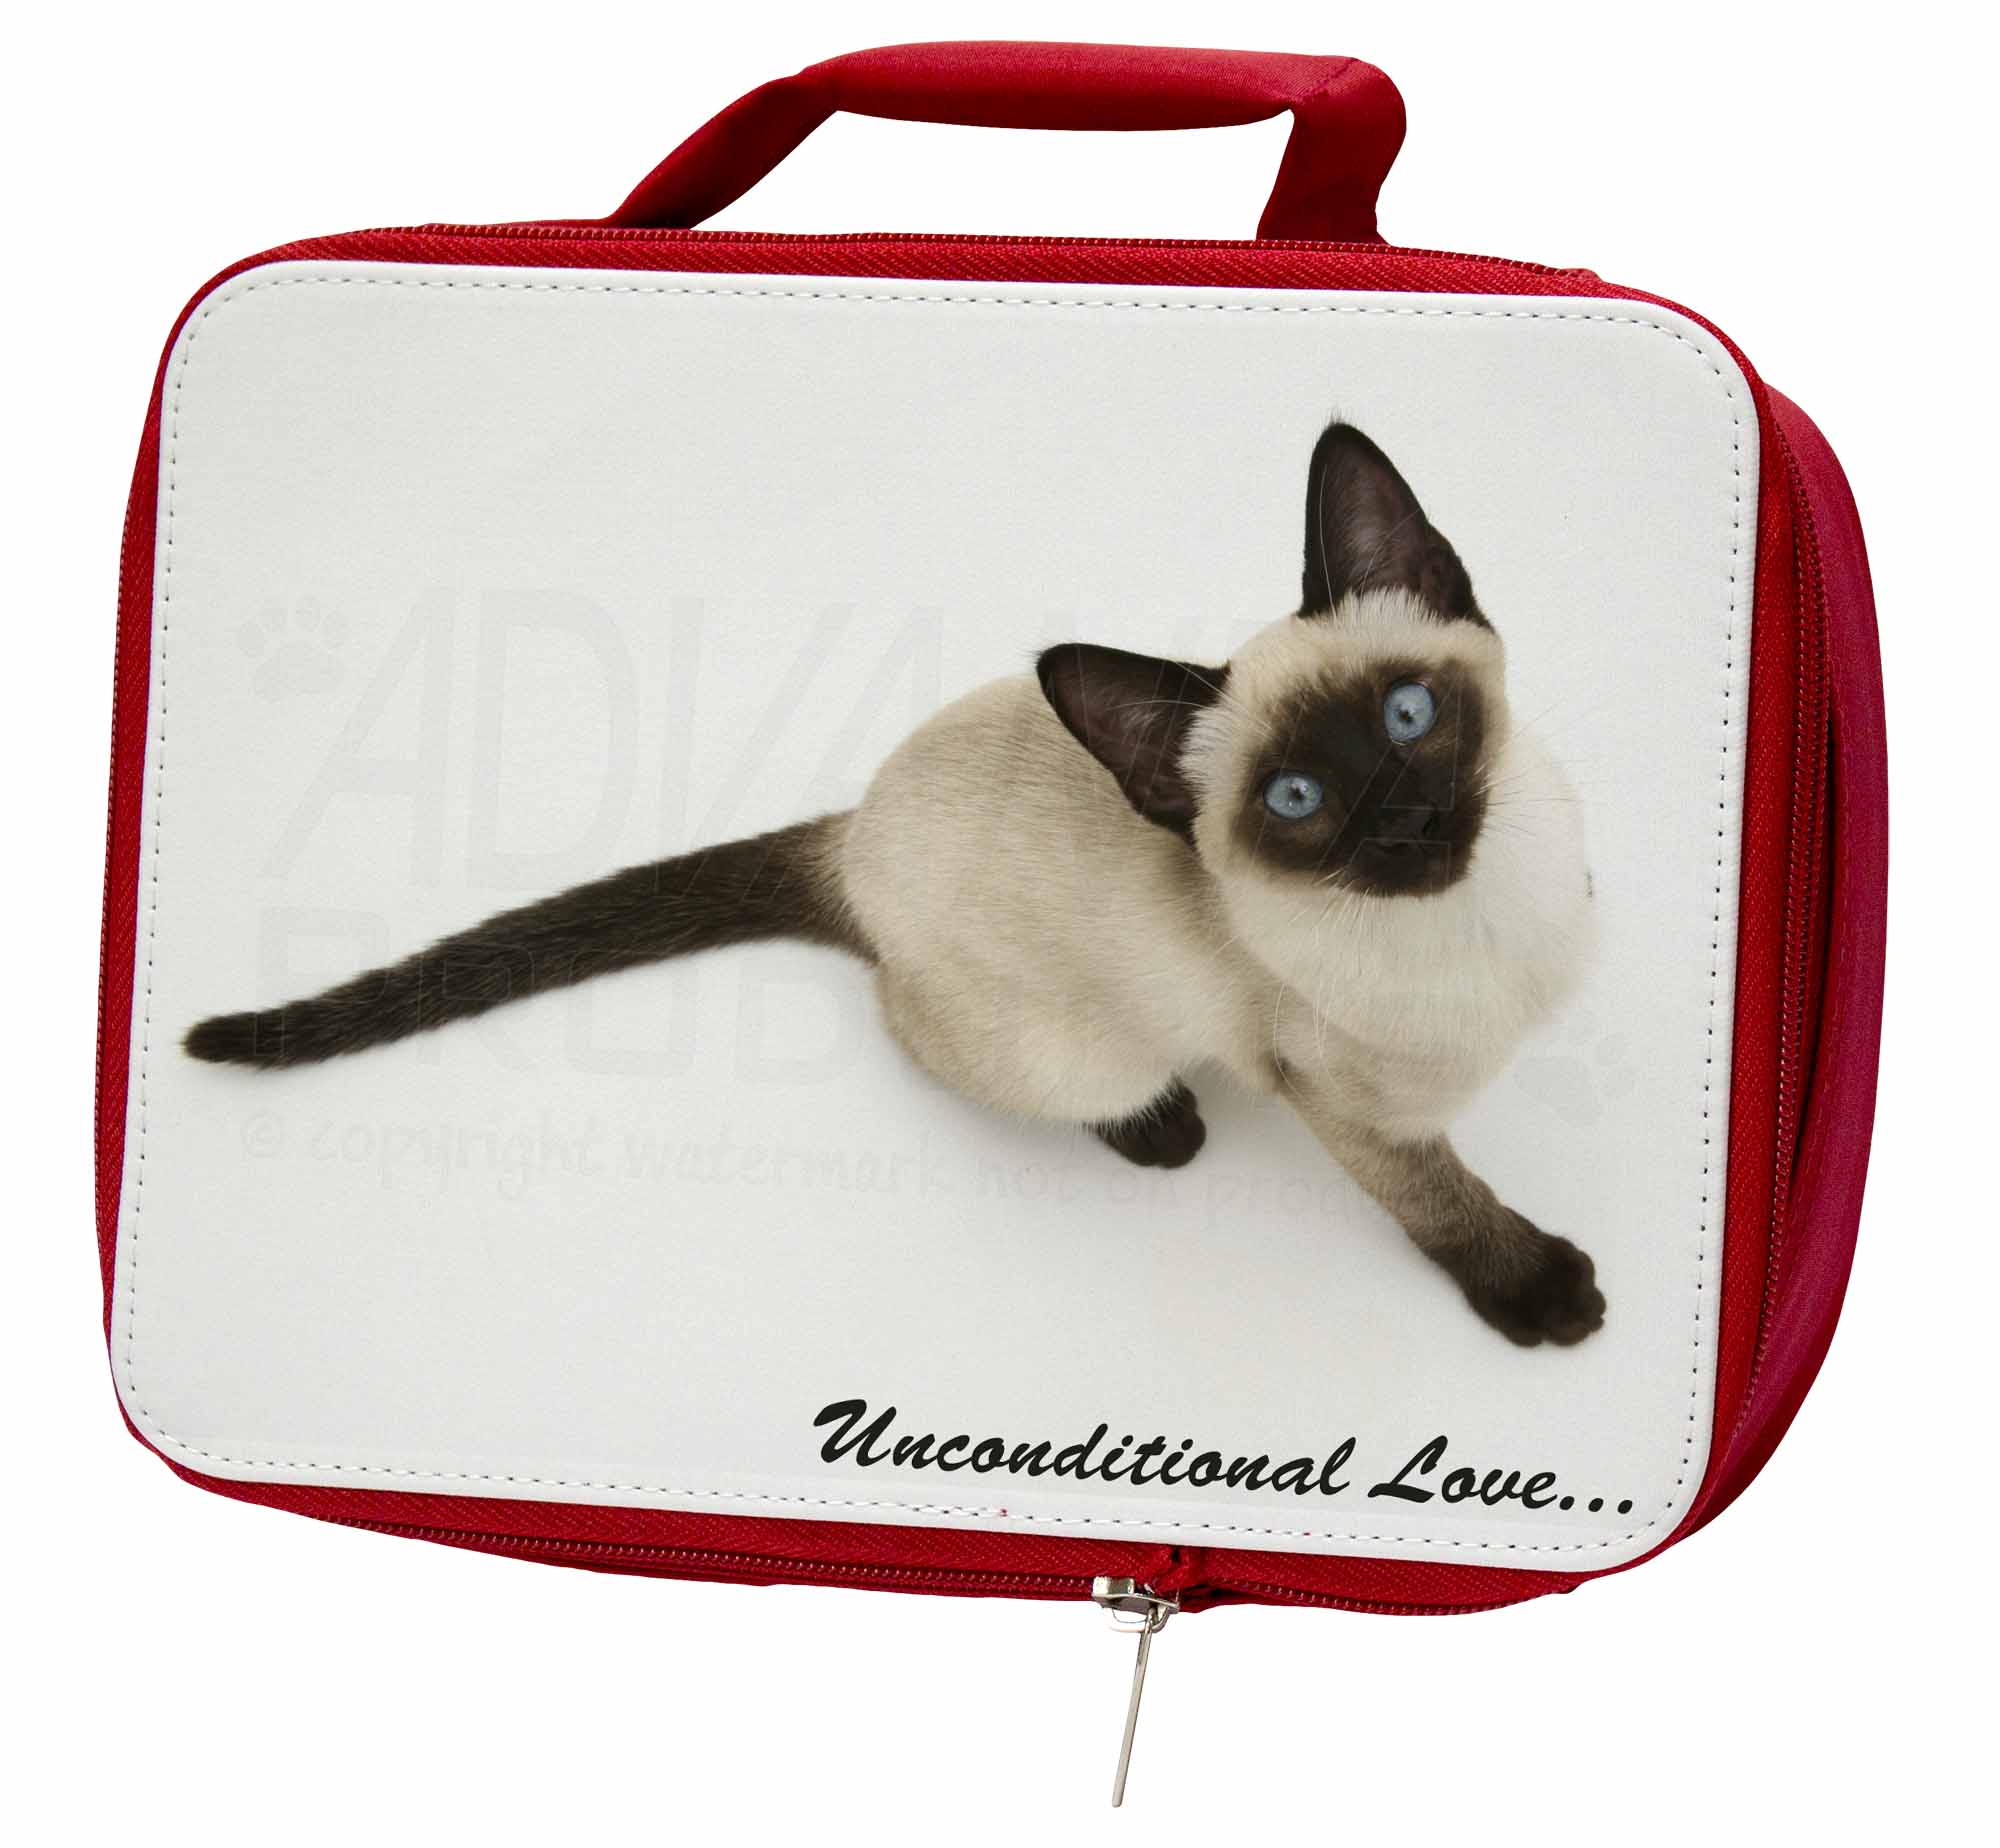 Siamese Cat Lunch 'Unconditional Love' Insulated Red School Lunch Cat Box/Picni, AC-66uLBR 5e0cb1